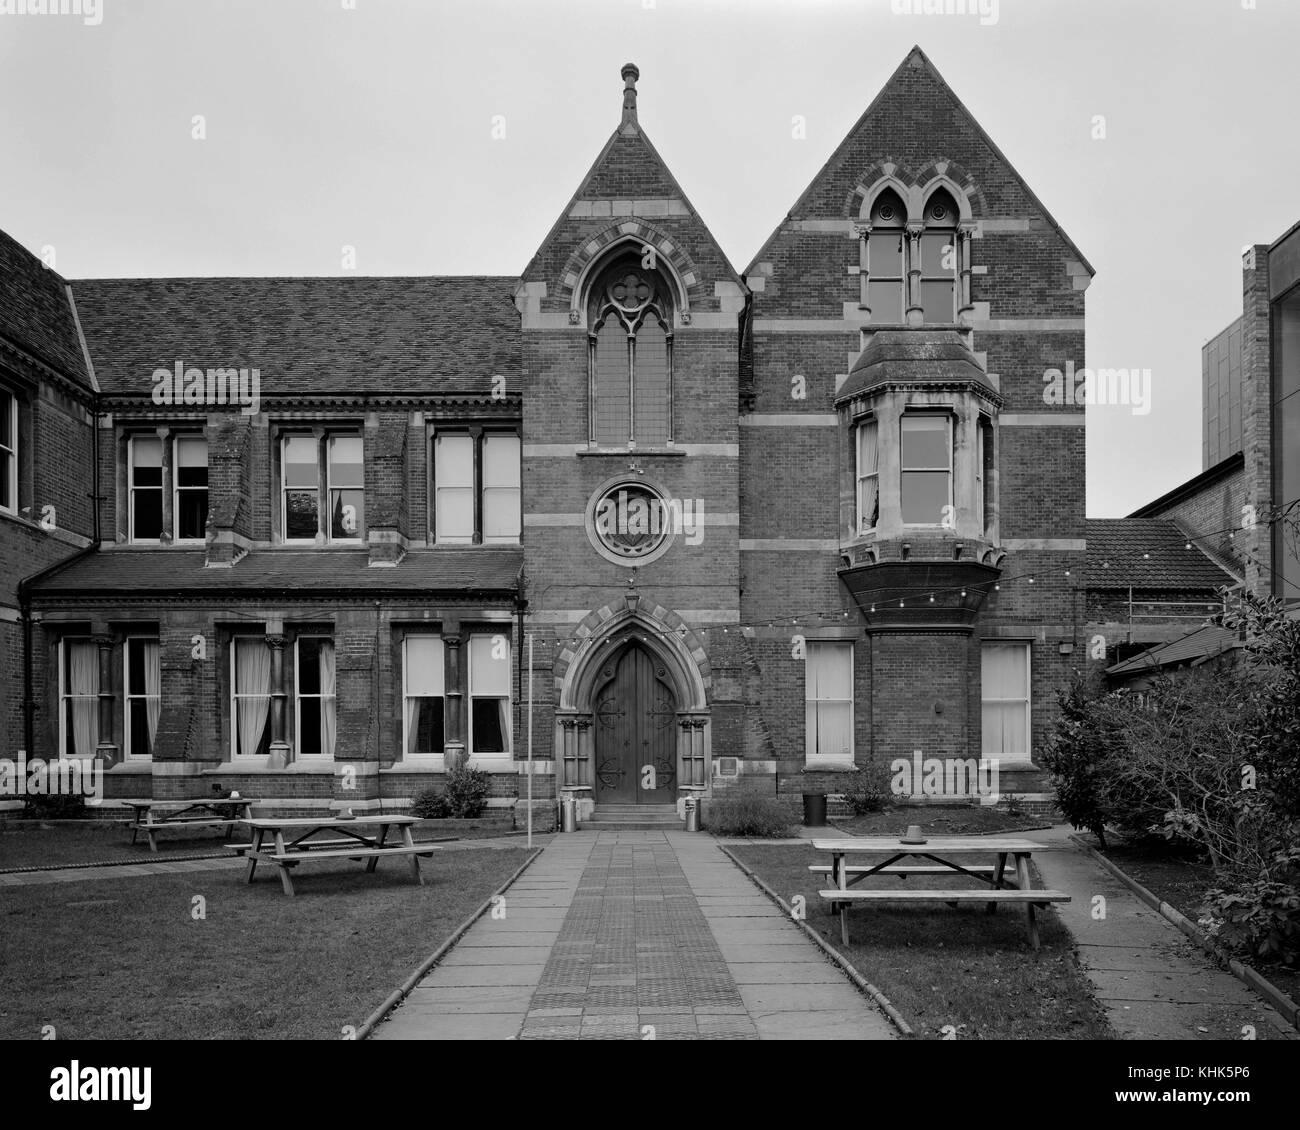 The Cambridge Union Society of Cambridge University - Stock Image